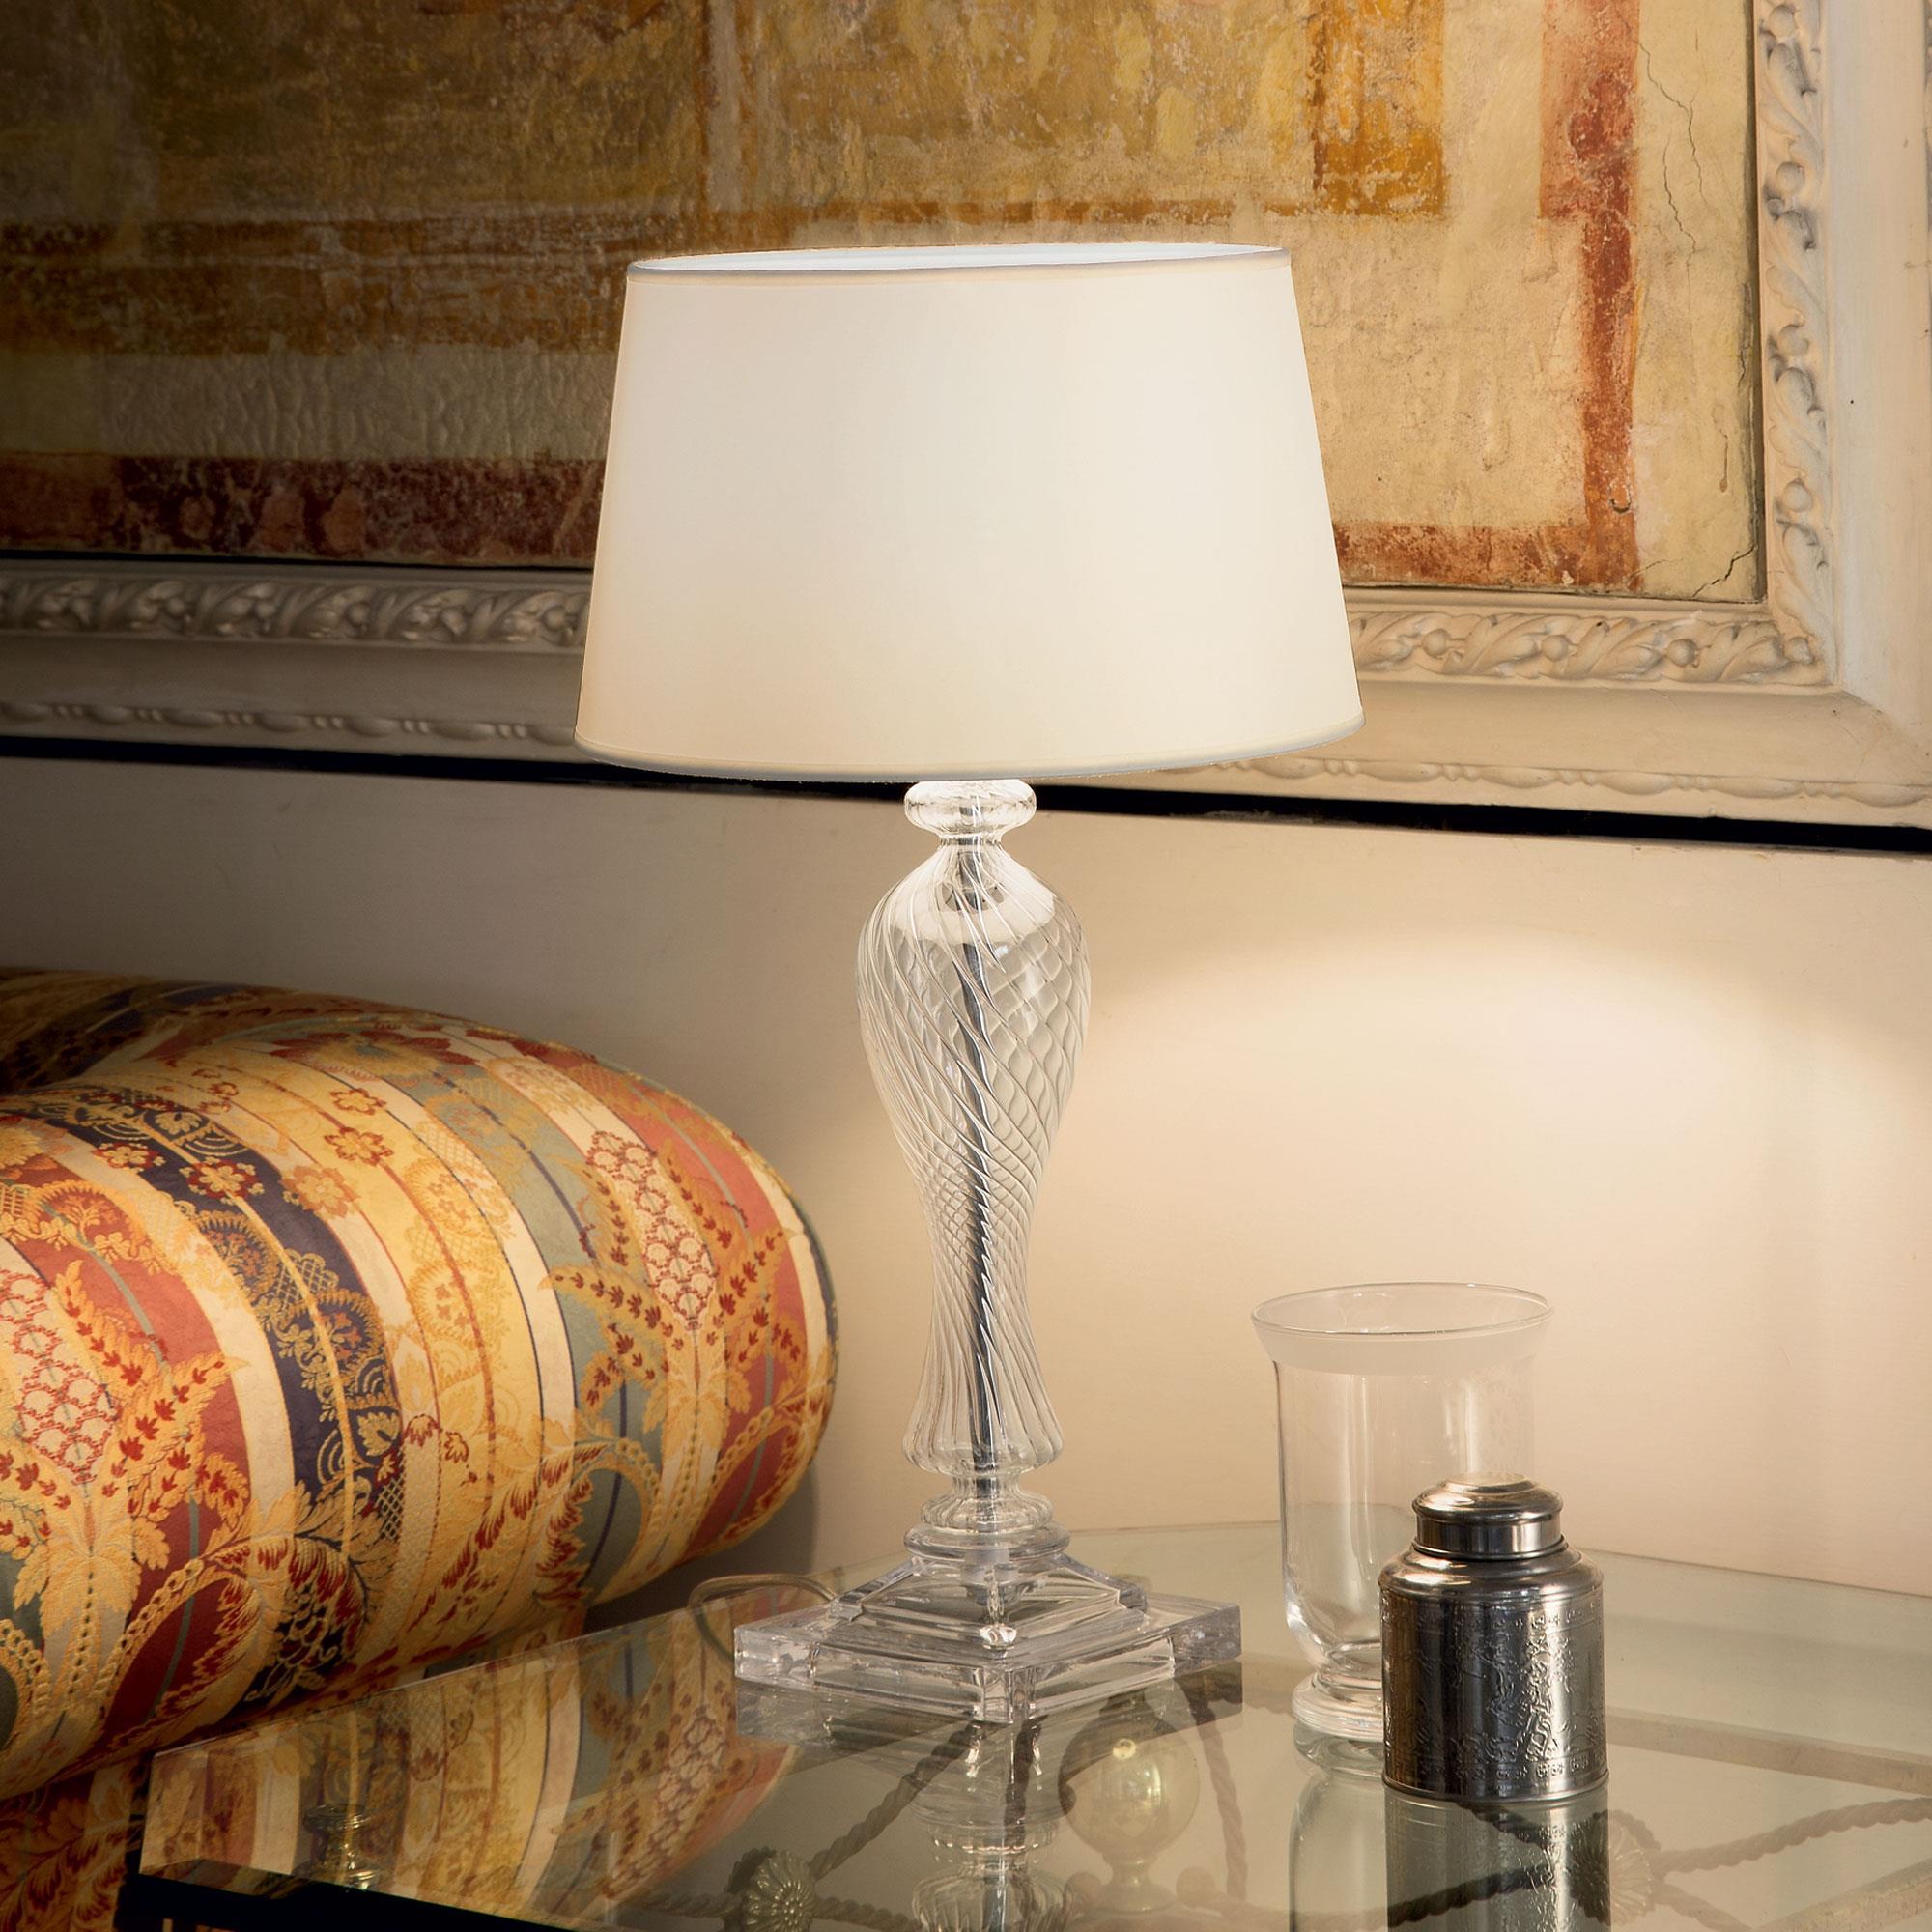 Ideal Lux 001180 Voga TL1 Bianco asztali lámpa